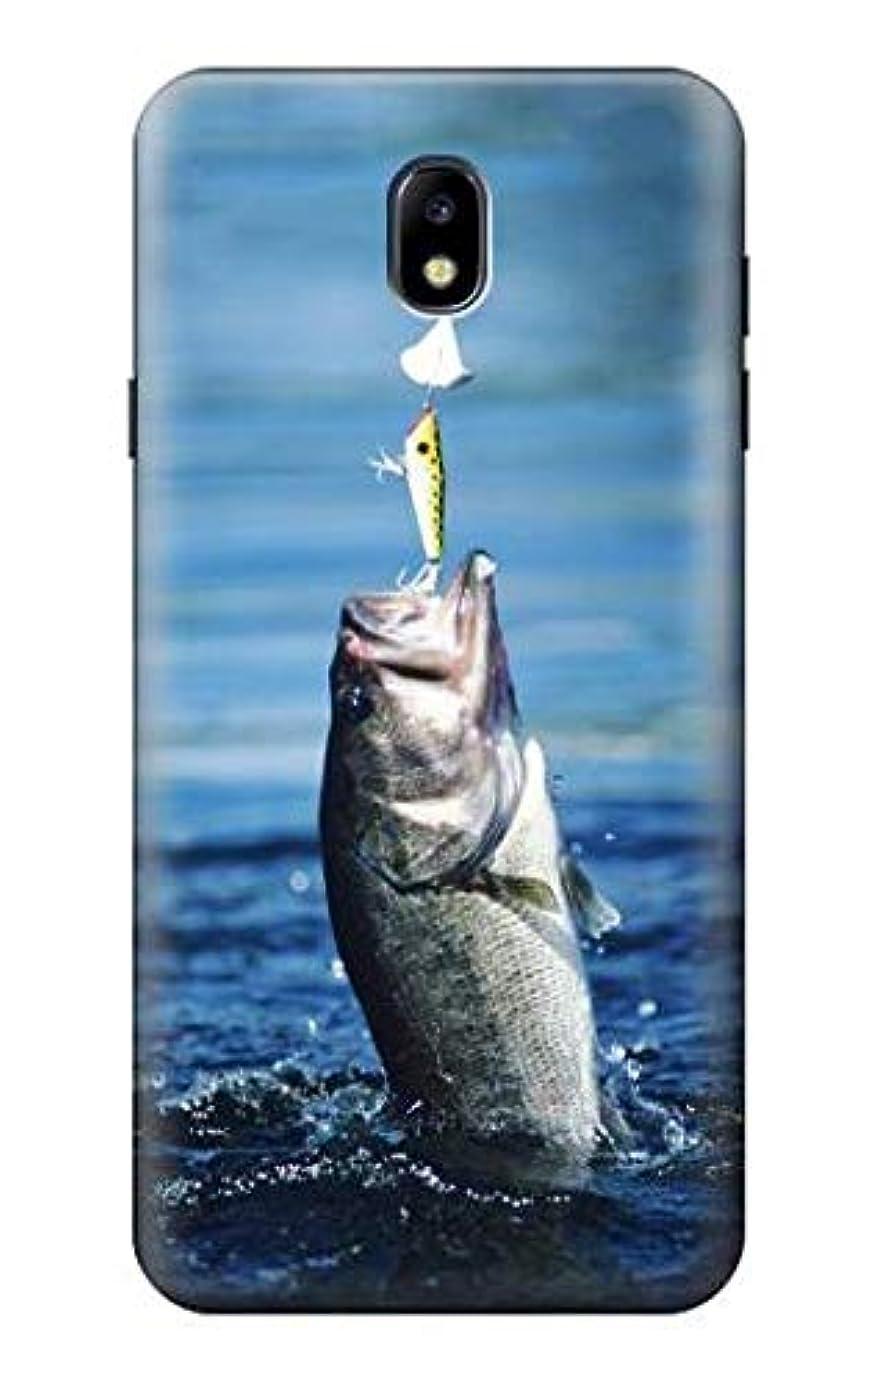 R1594 Bass Fishing Case Cover for Samsung Galaxy J7 (2018), J7 Aero, J7 Top, J7 Aura, J7 Crown, J7 Refine, J7 Eon, J7 V 2nd Gen, J7 Star tnd8242967